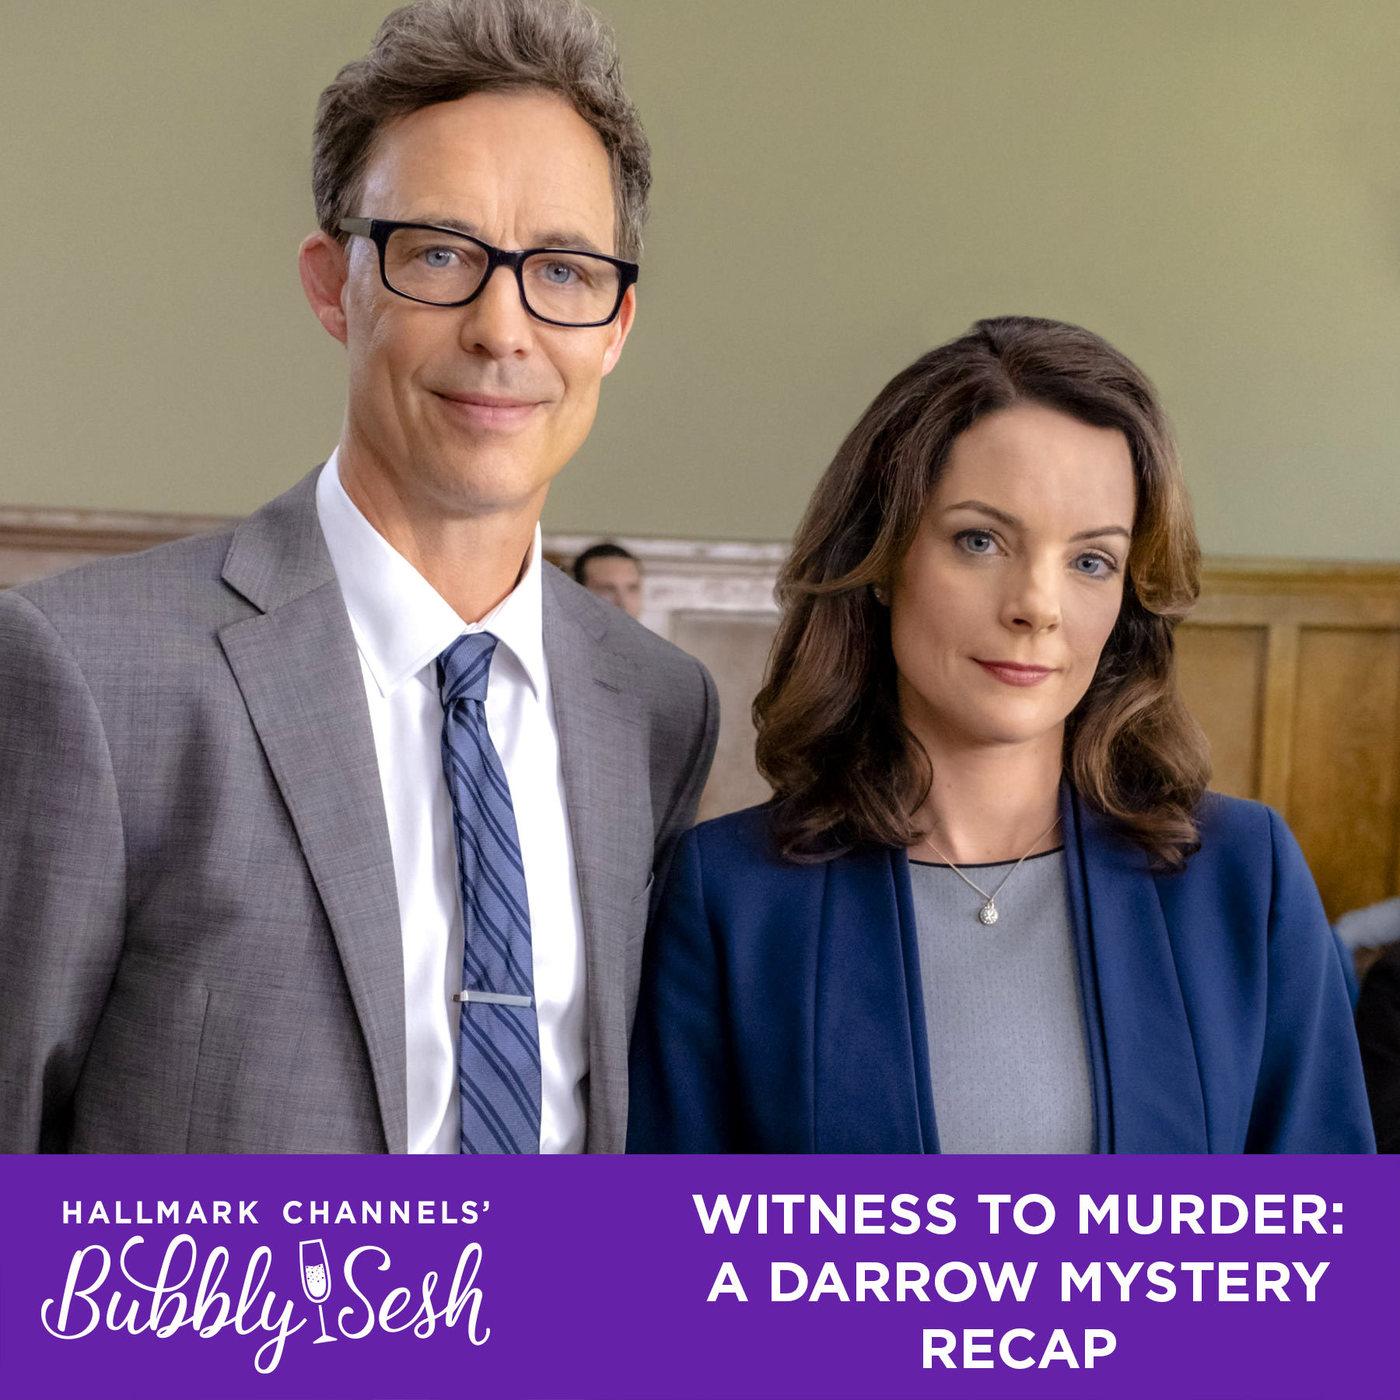 Witness to Murder: A Darrow Mystery Recap | Hallmark Channel's Bubbly Sesh